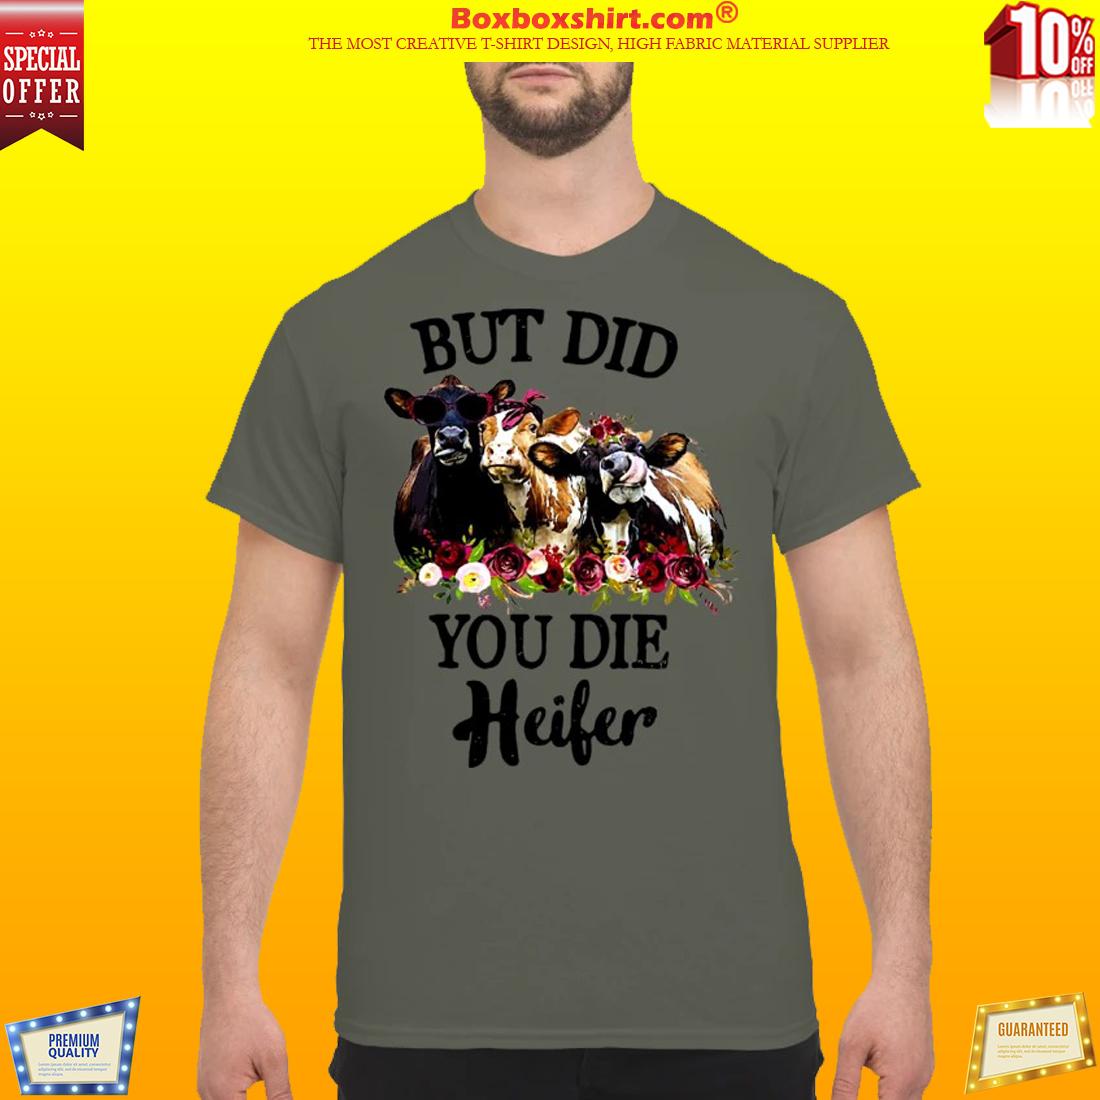 But did you die heifer classic shirt